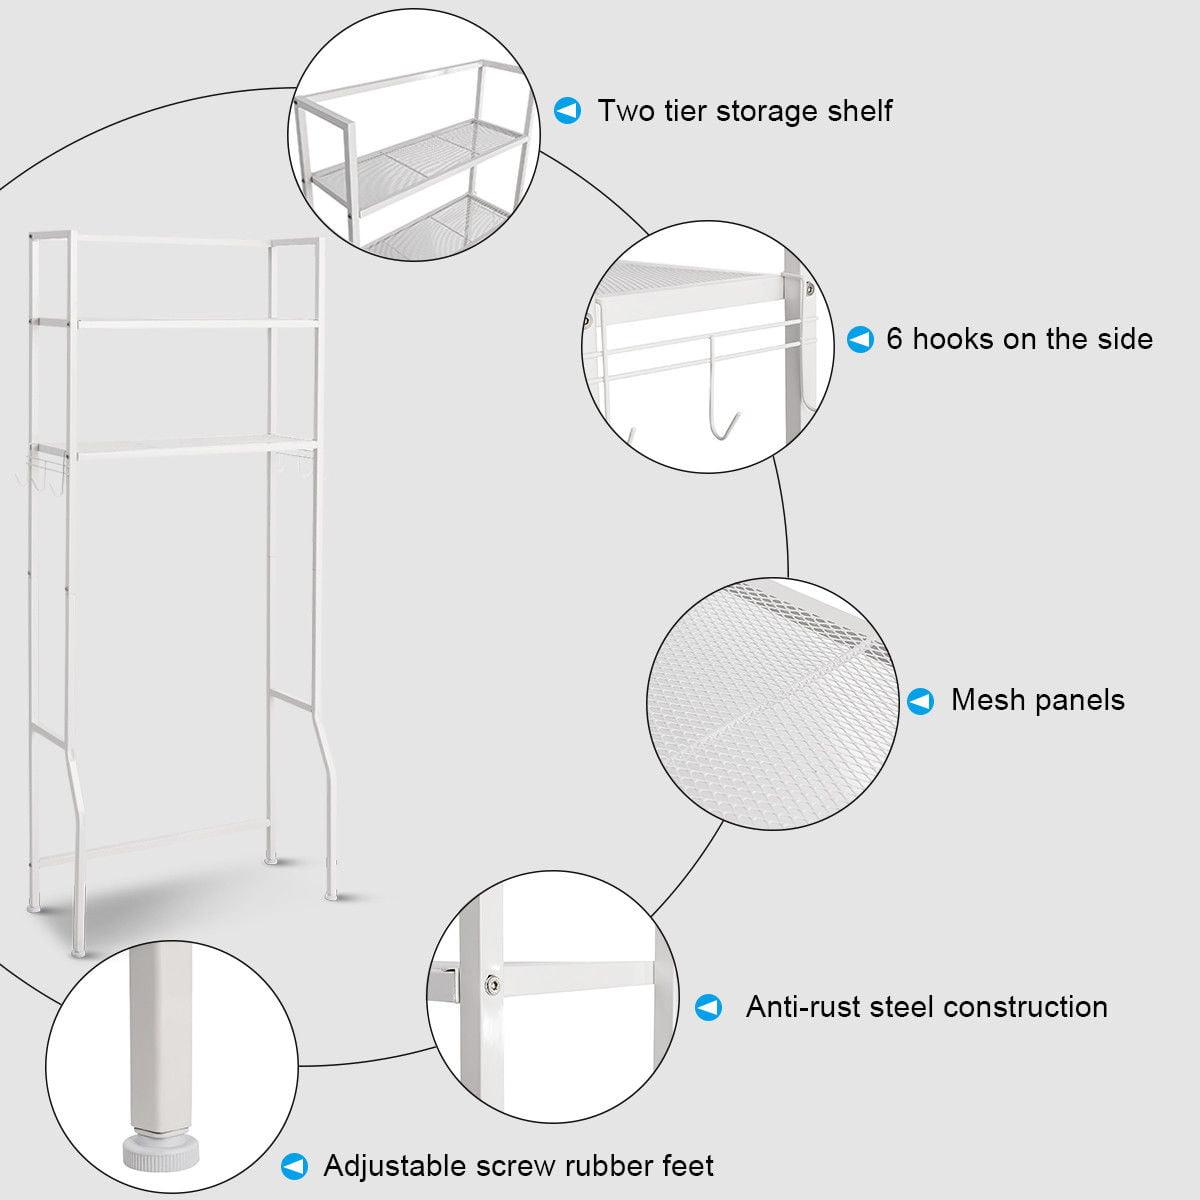 2 Tire Space Saver Storage Rack Over Washing Machine Laundry Toilet Bathroom